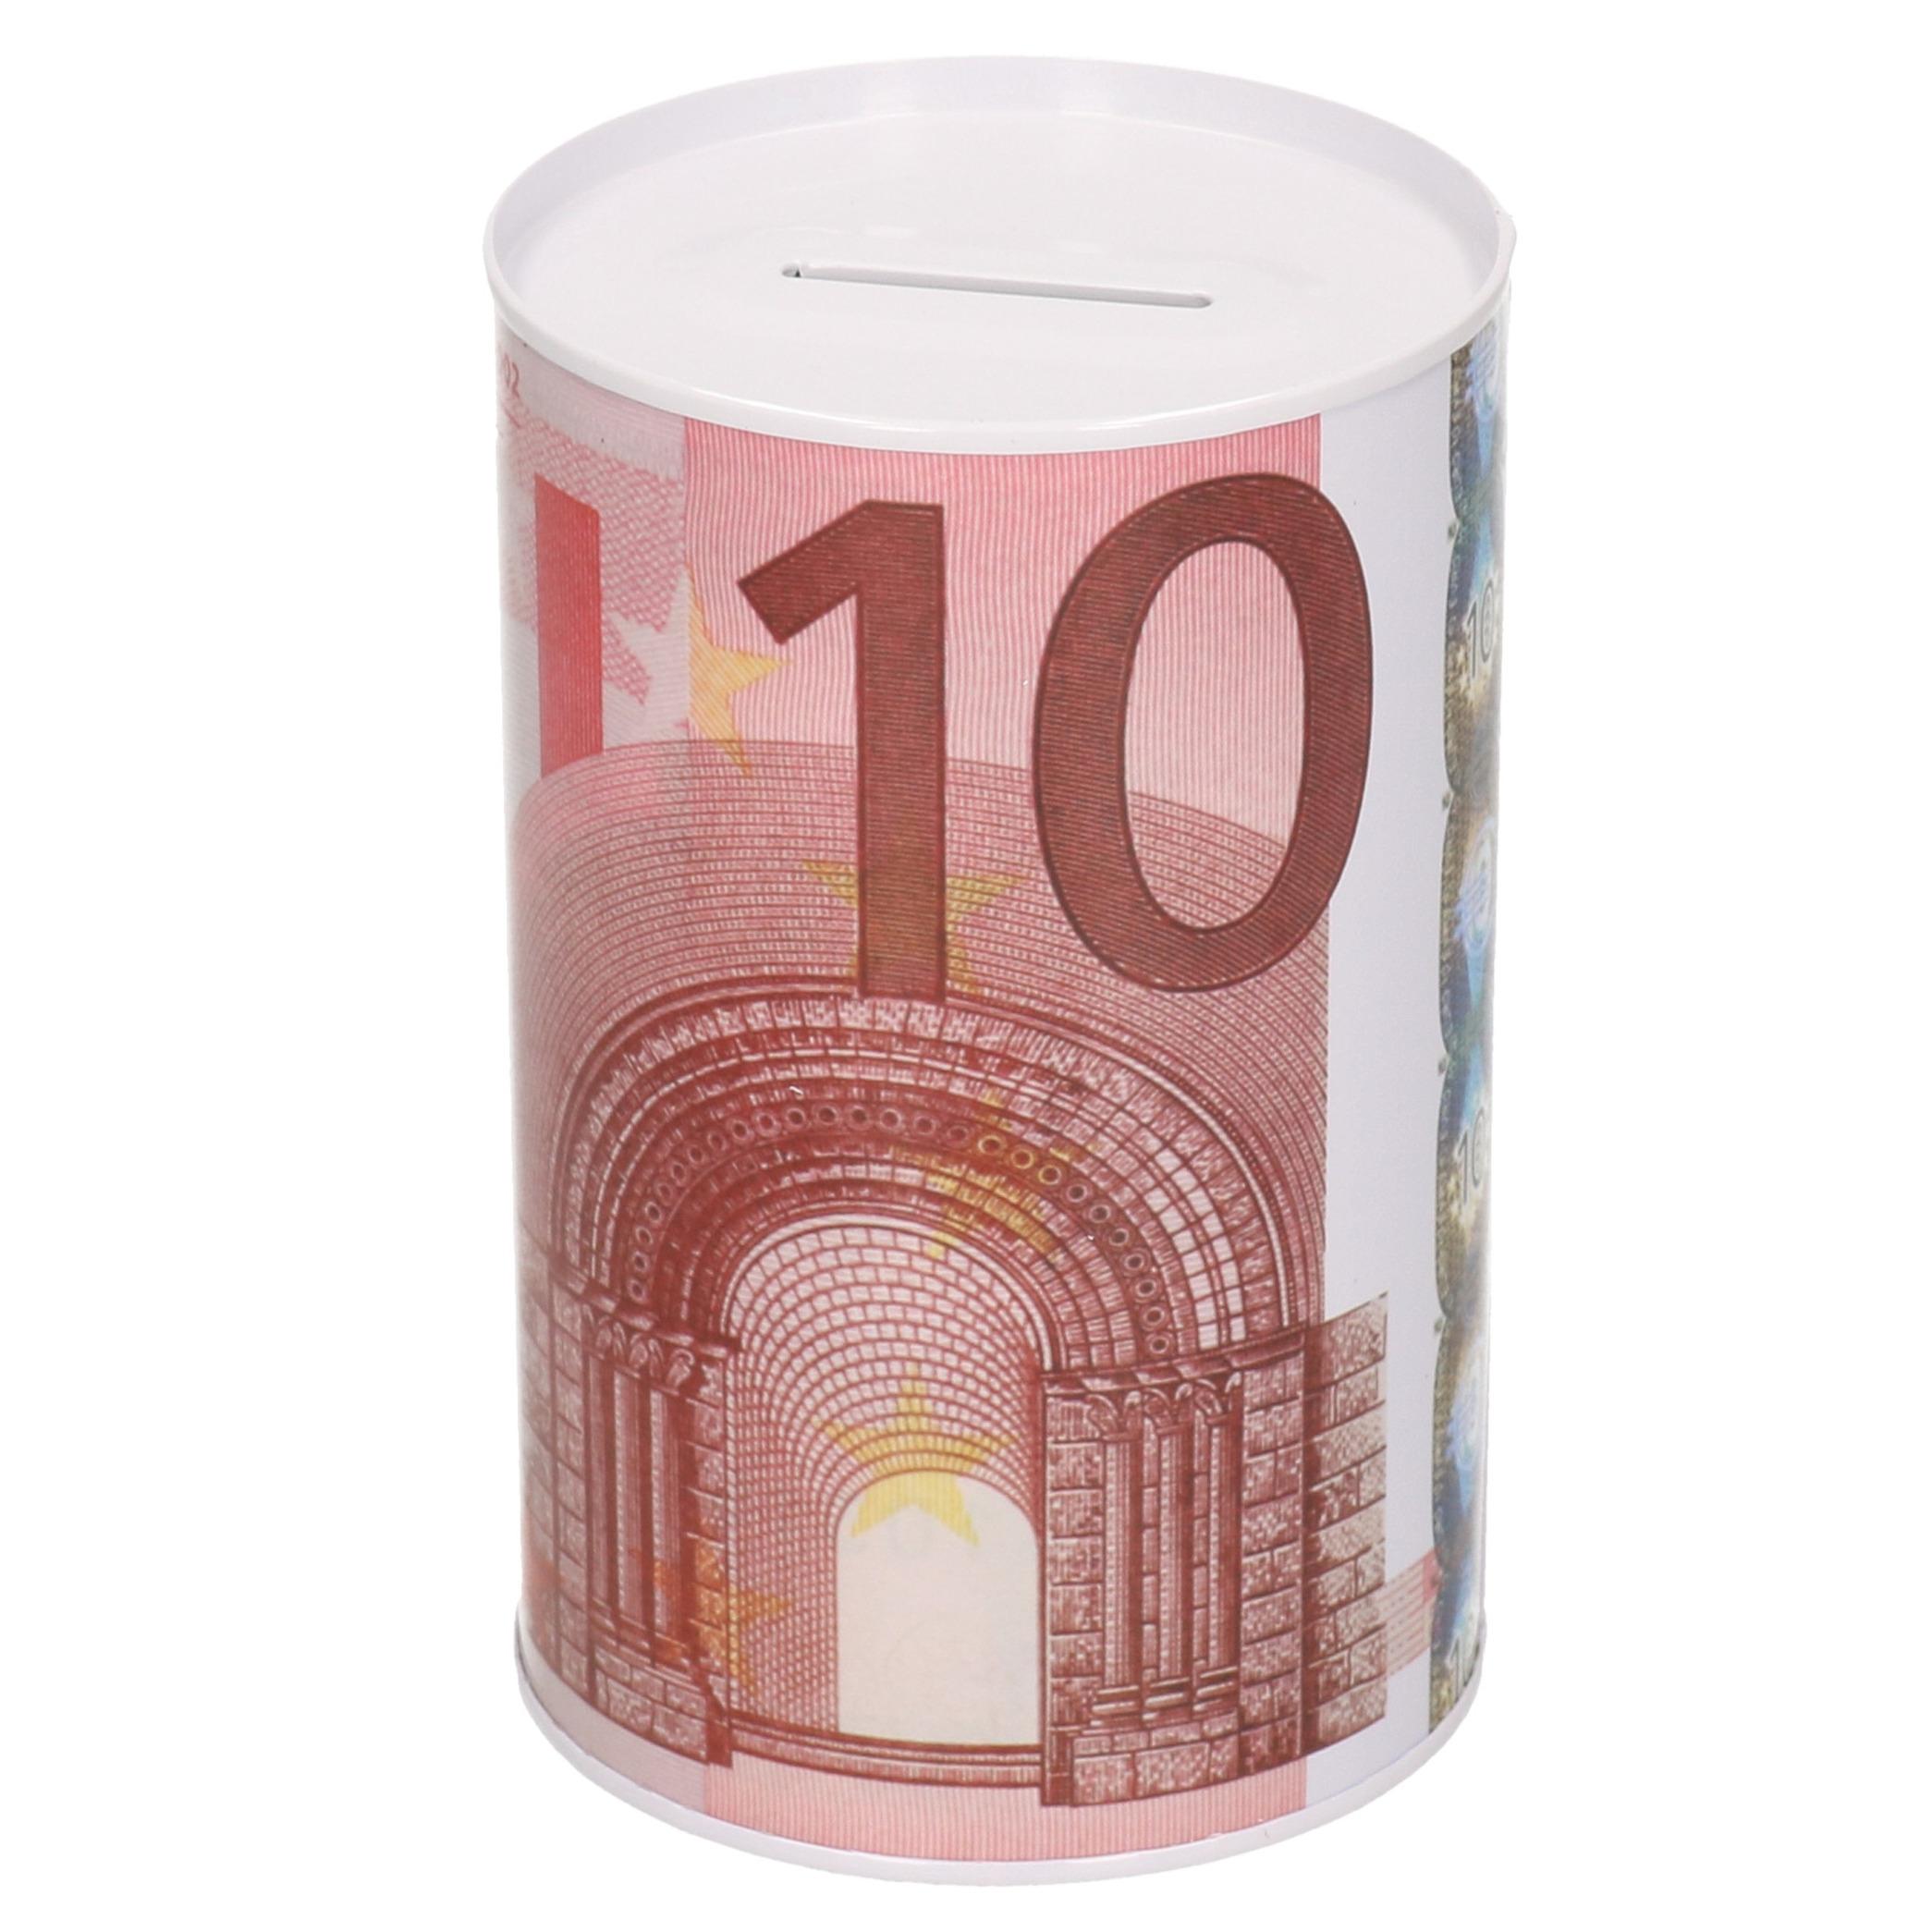 Spaarpot blik 10 euro biljet 8 x 15 cm